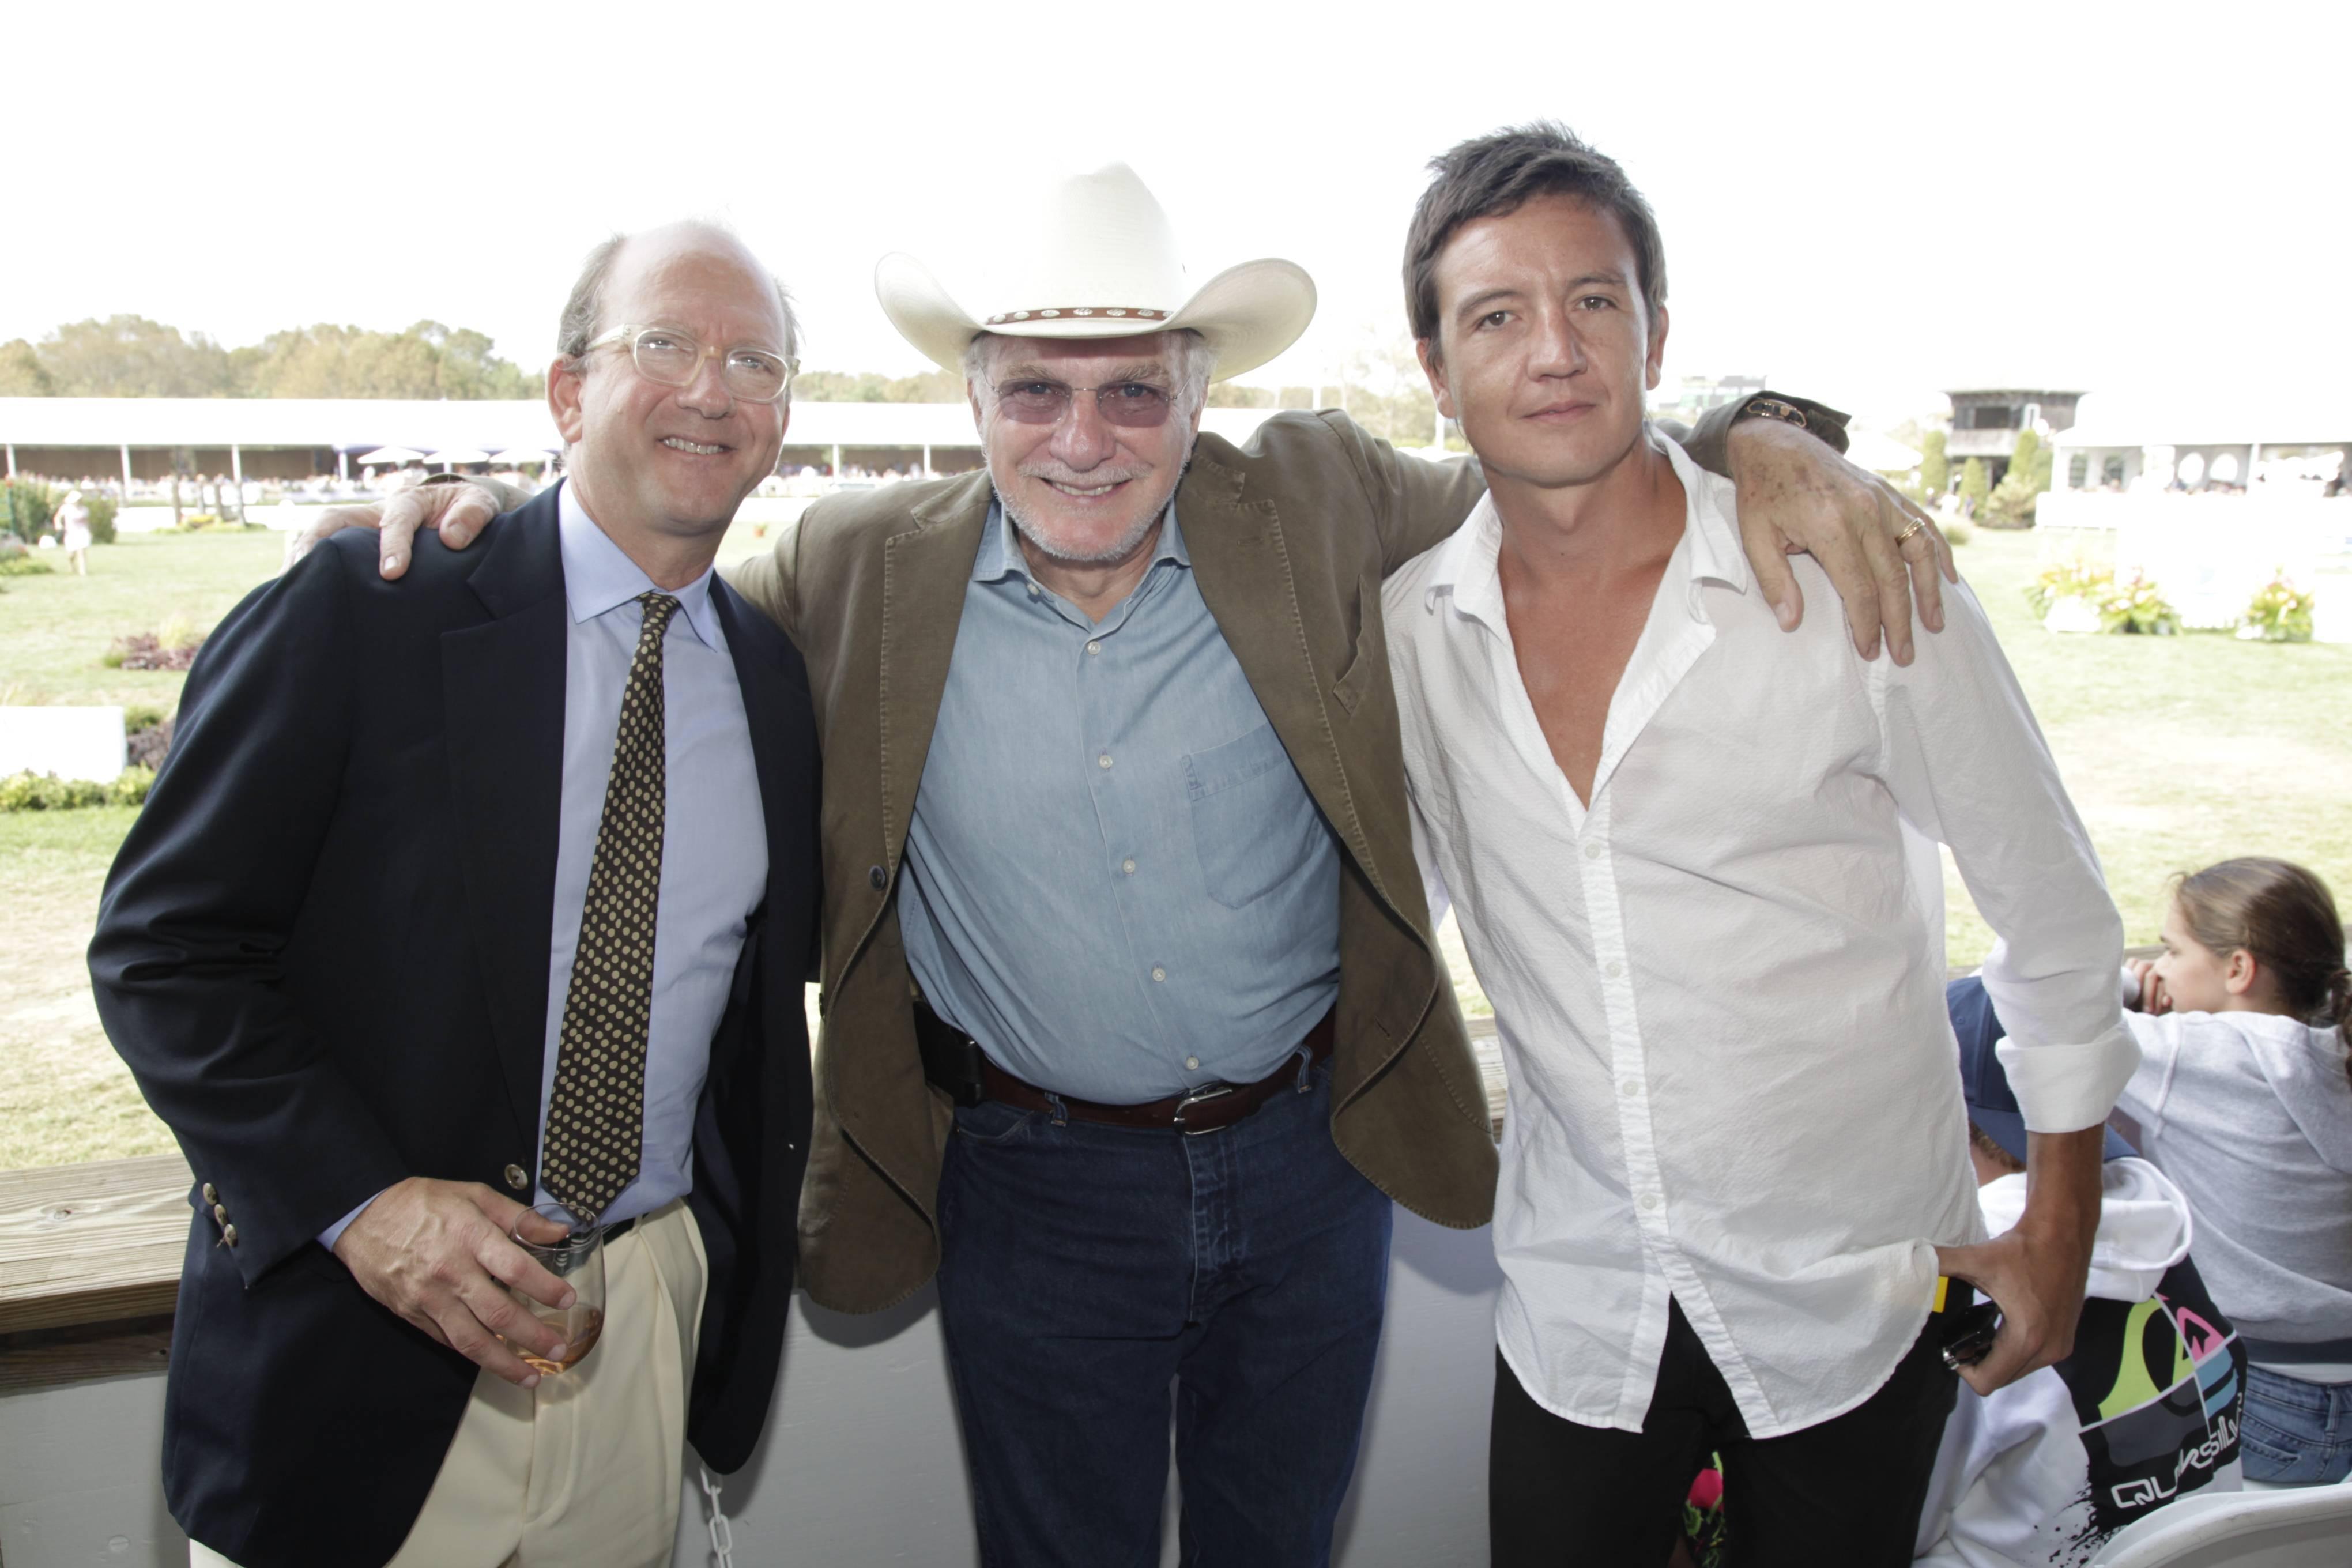 Bruce Herzog, David Yrman,Anthony James